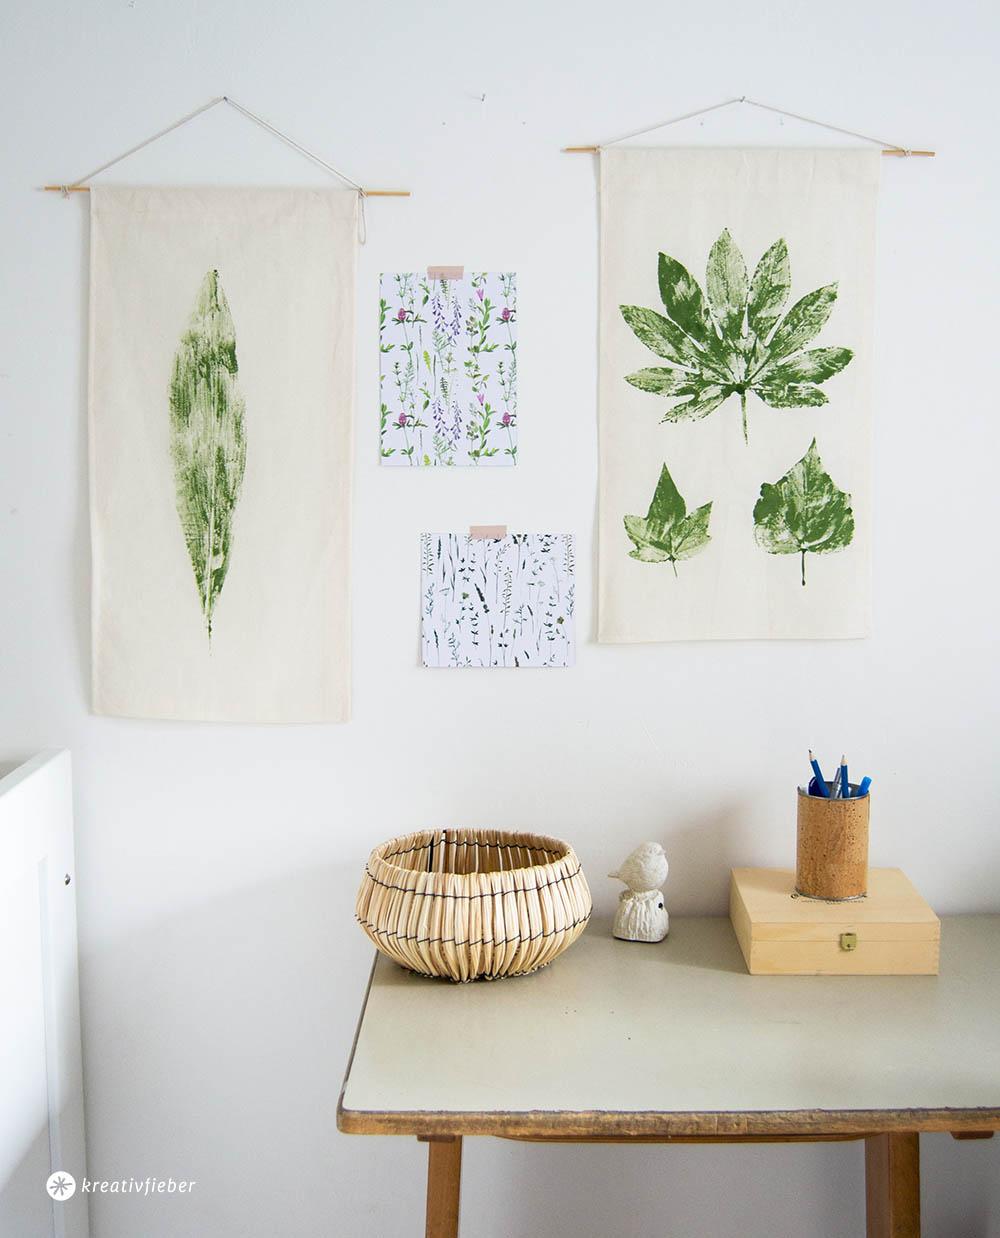 diy bl tter auf stoff drucken tutorial. Black Bedroom Furniture Sets. Home Design Ideas